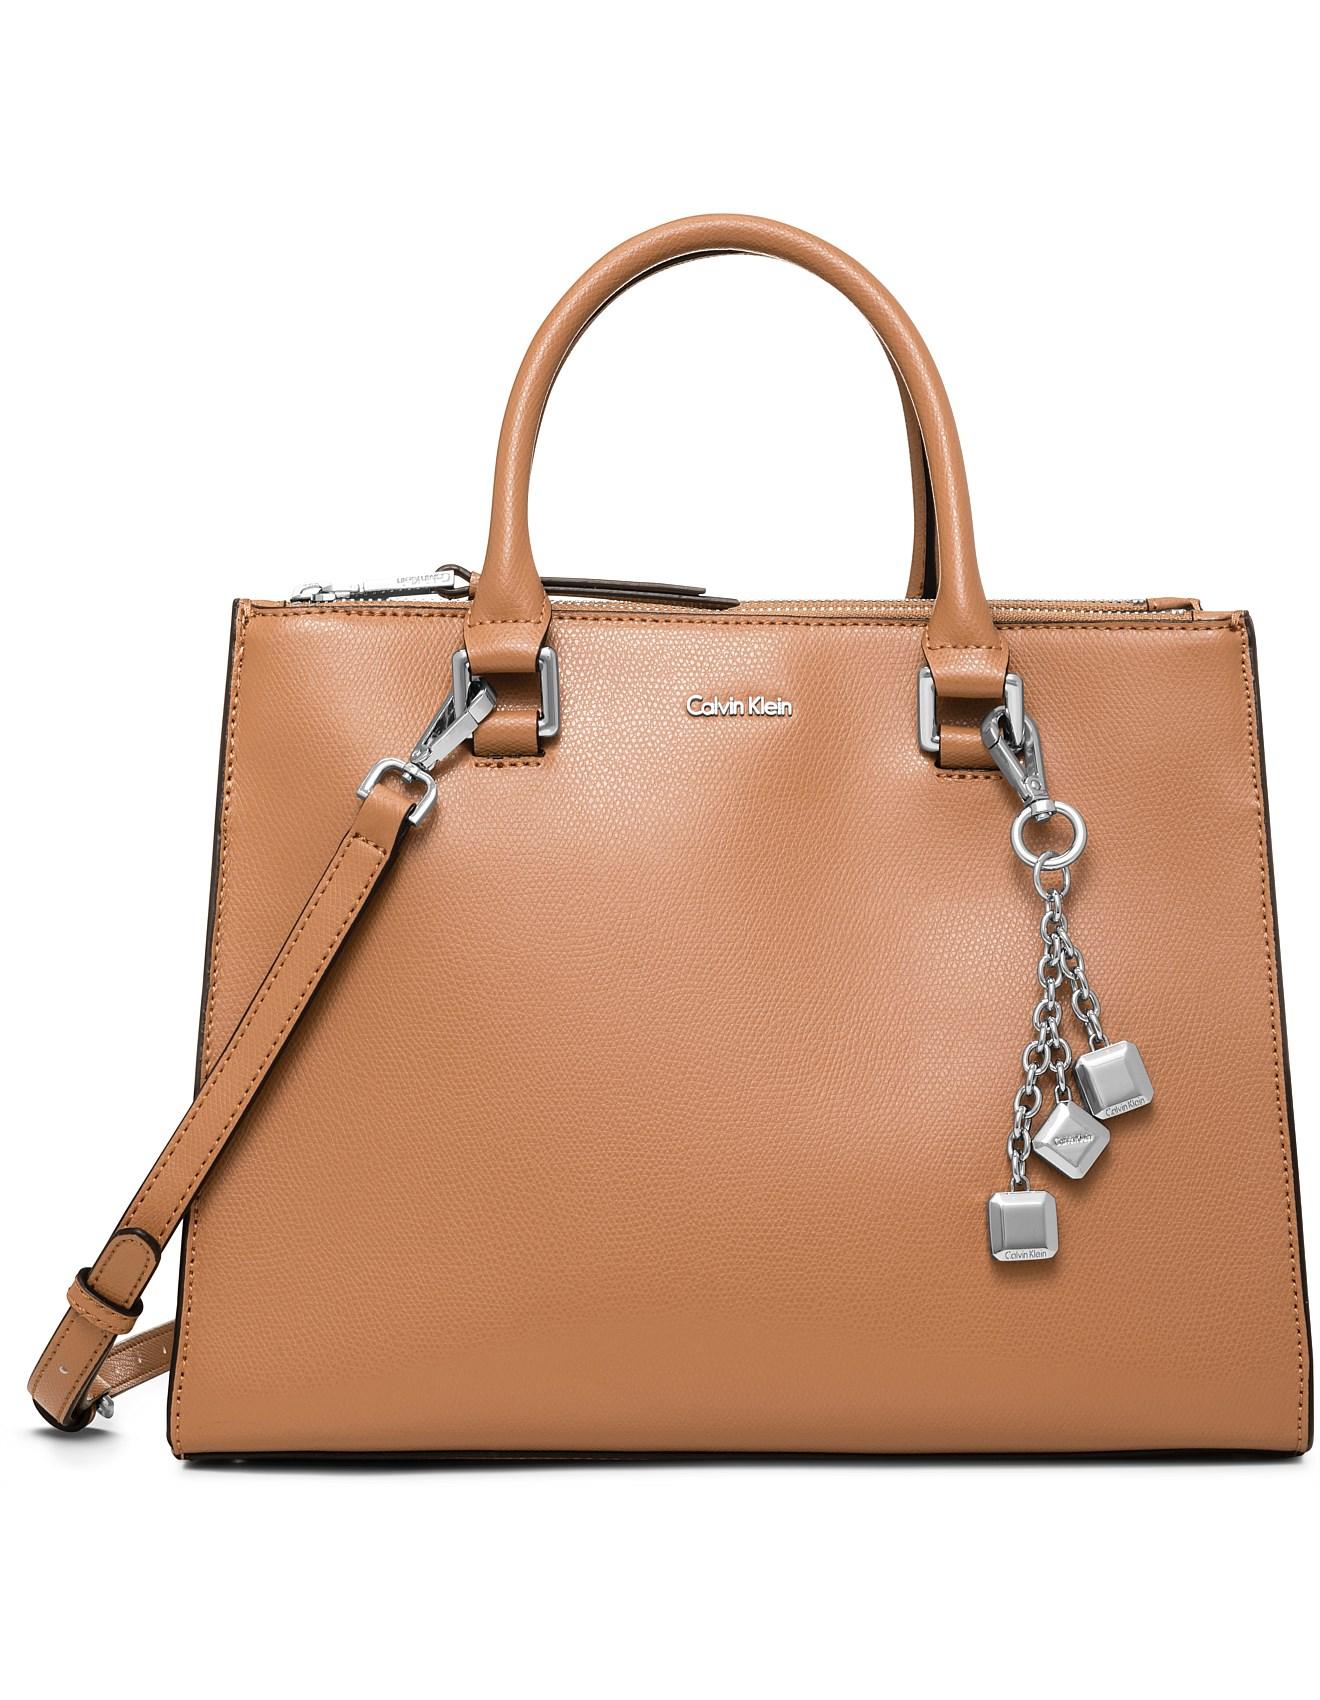 Women S Shoulder Bags Handbags Australia David Jones Logan Satchel